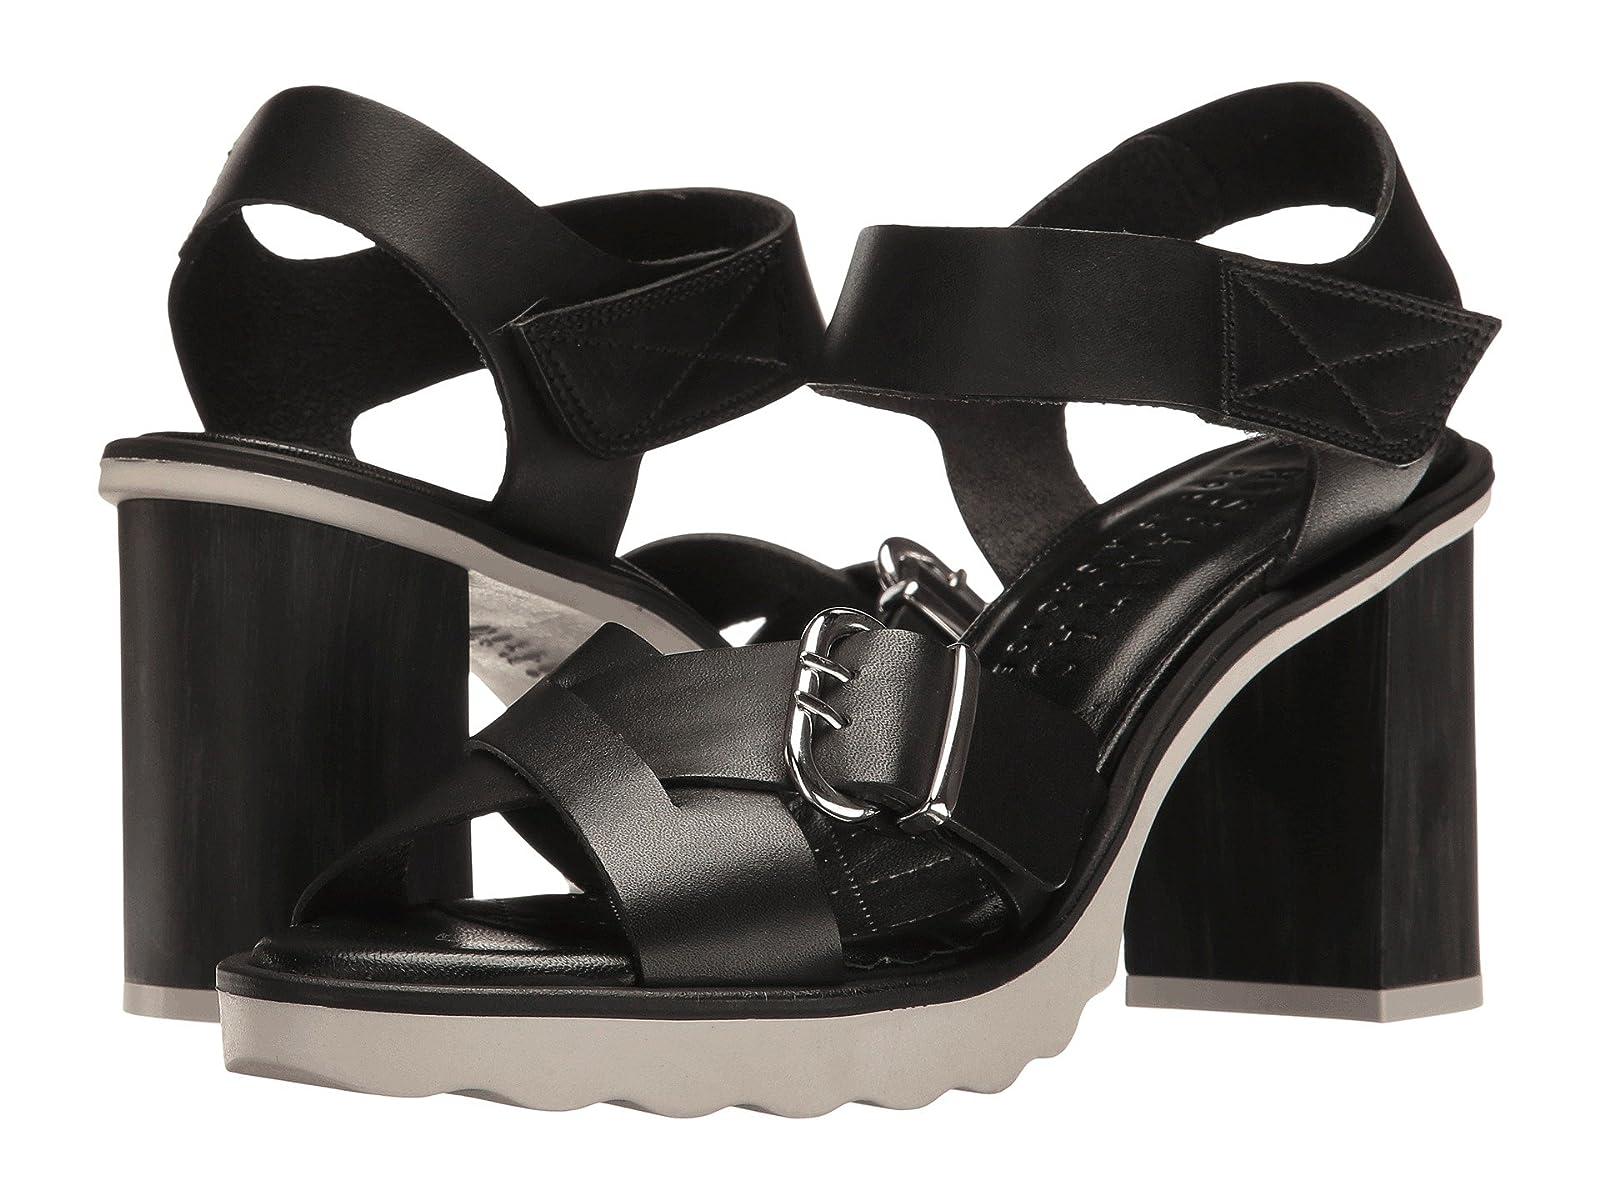 Hispanitas GigiCheap and distinctive eye-catching shoes